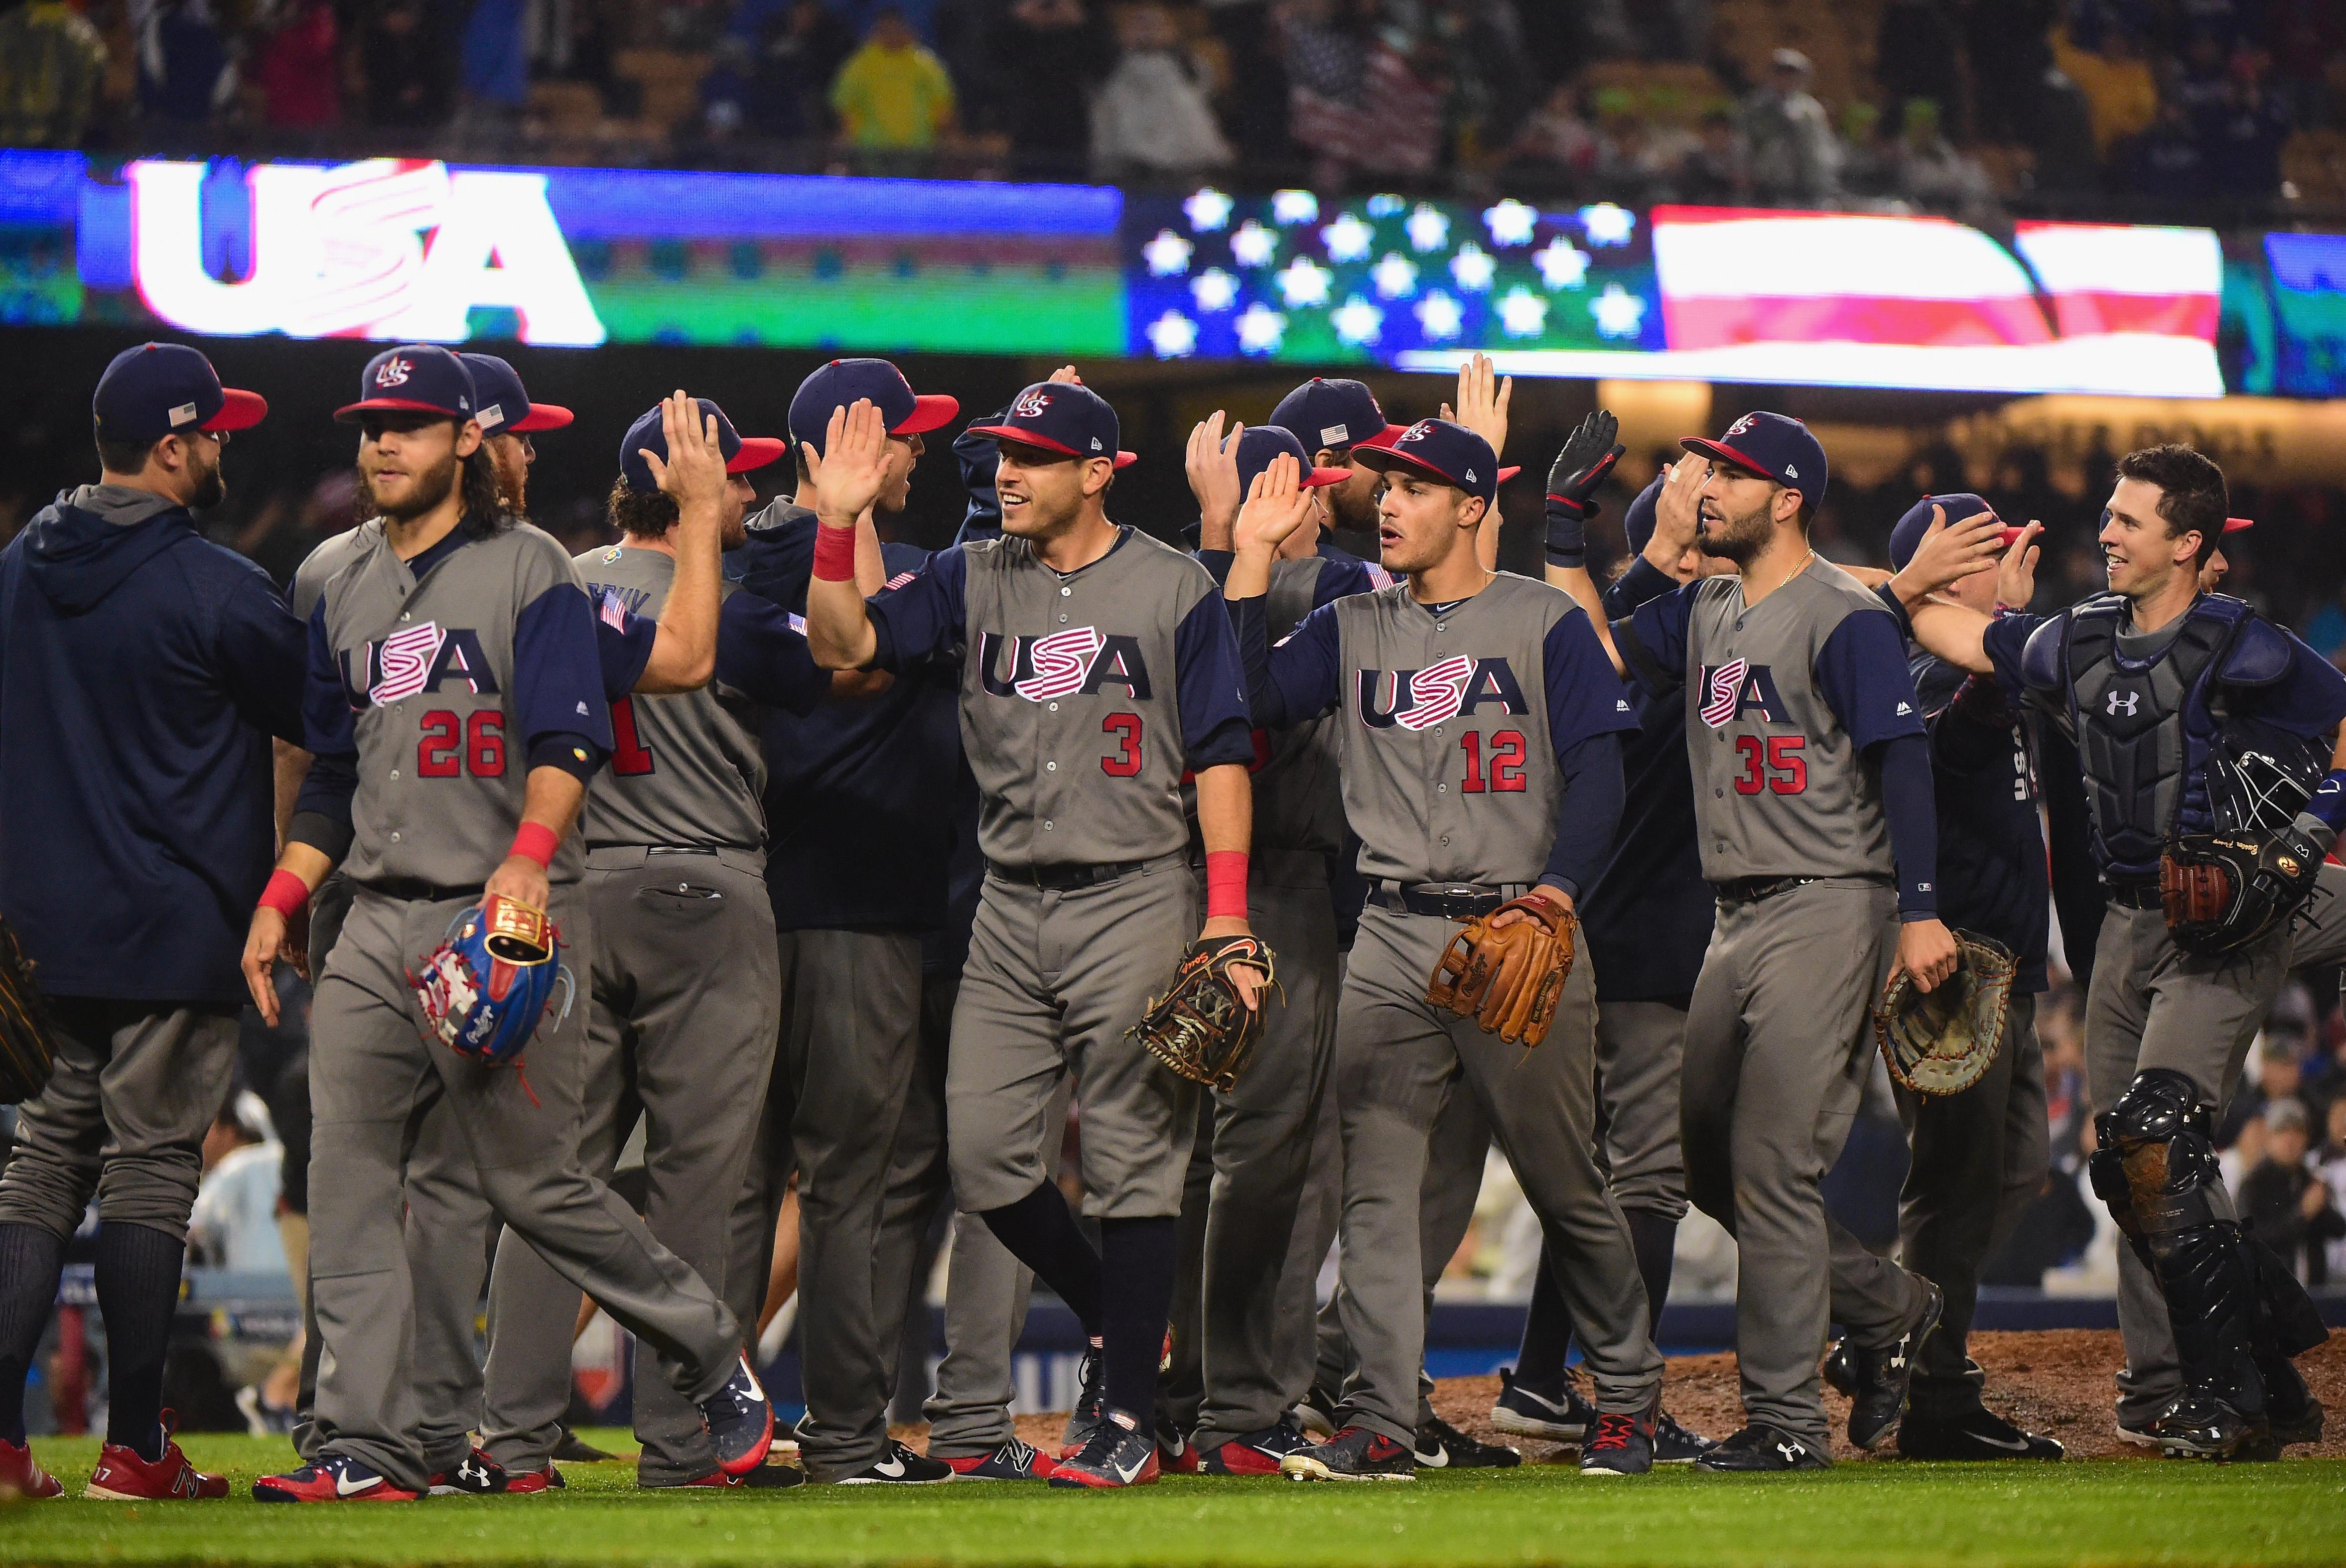 World Baseball Classic - Championship Round - Game 2 - United States v Japan